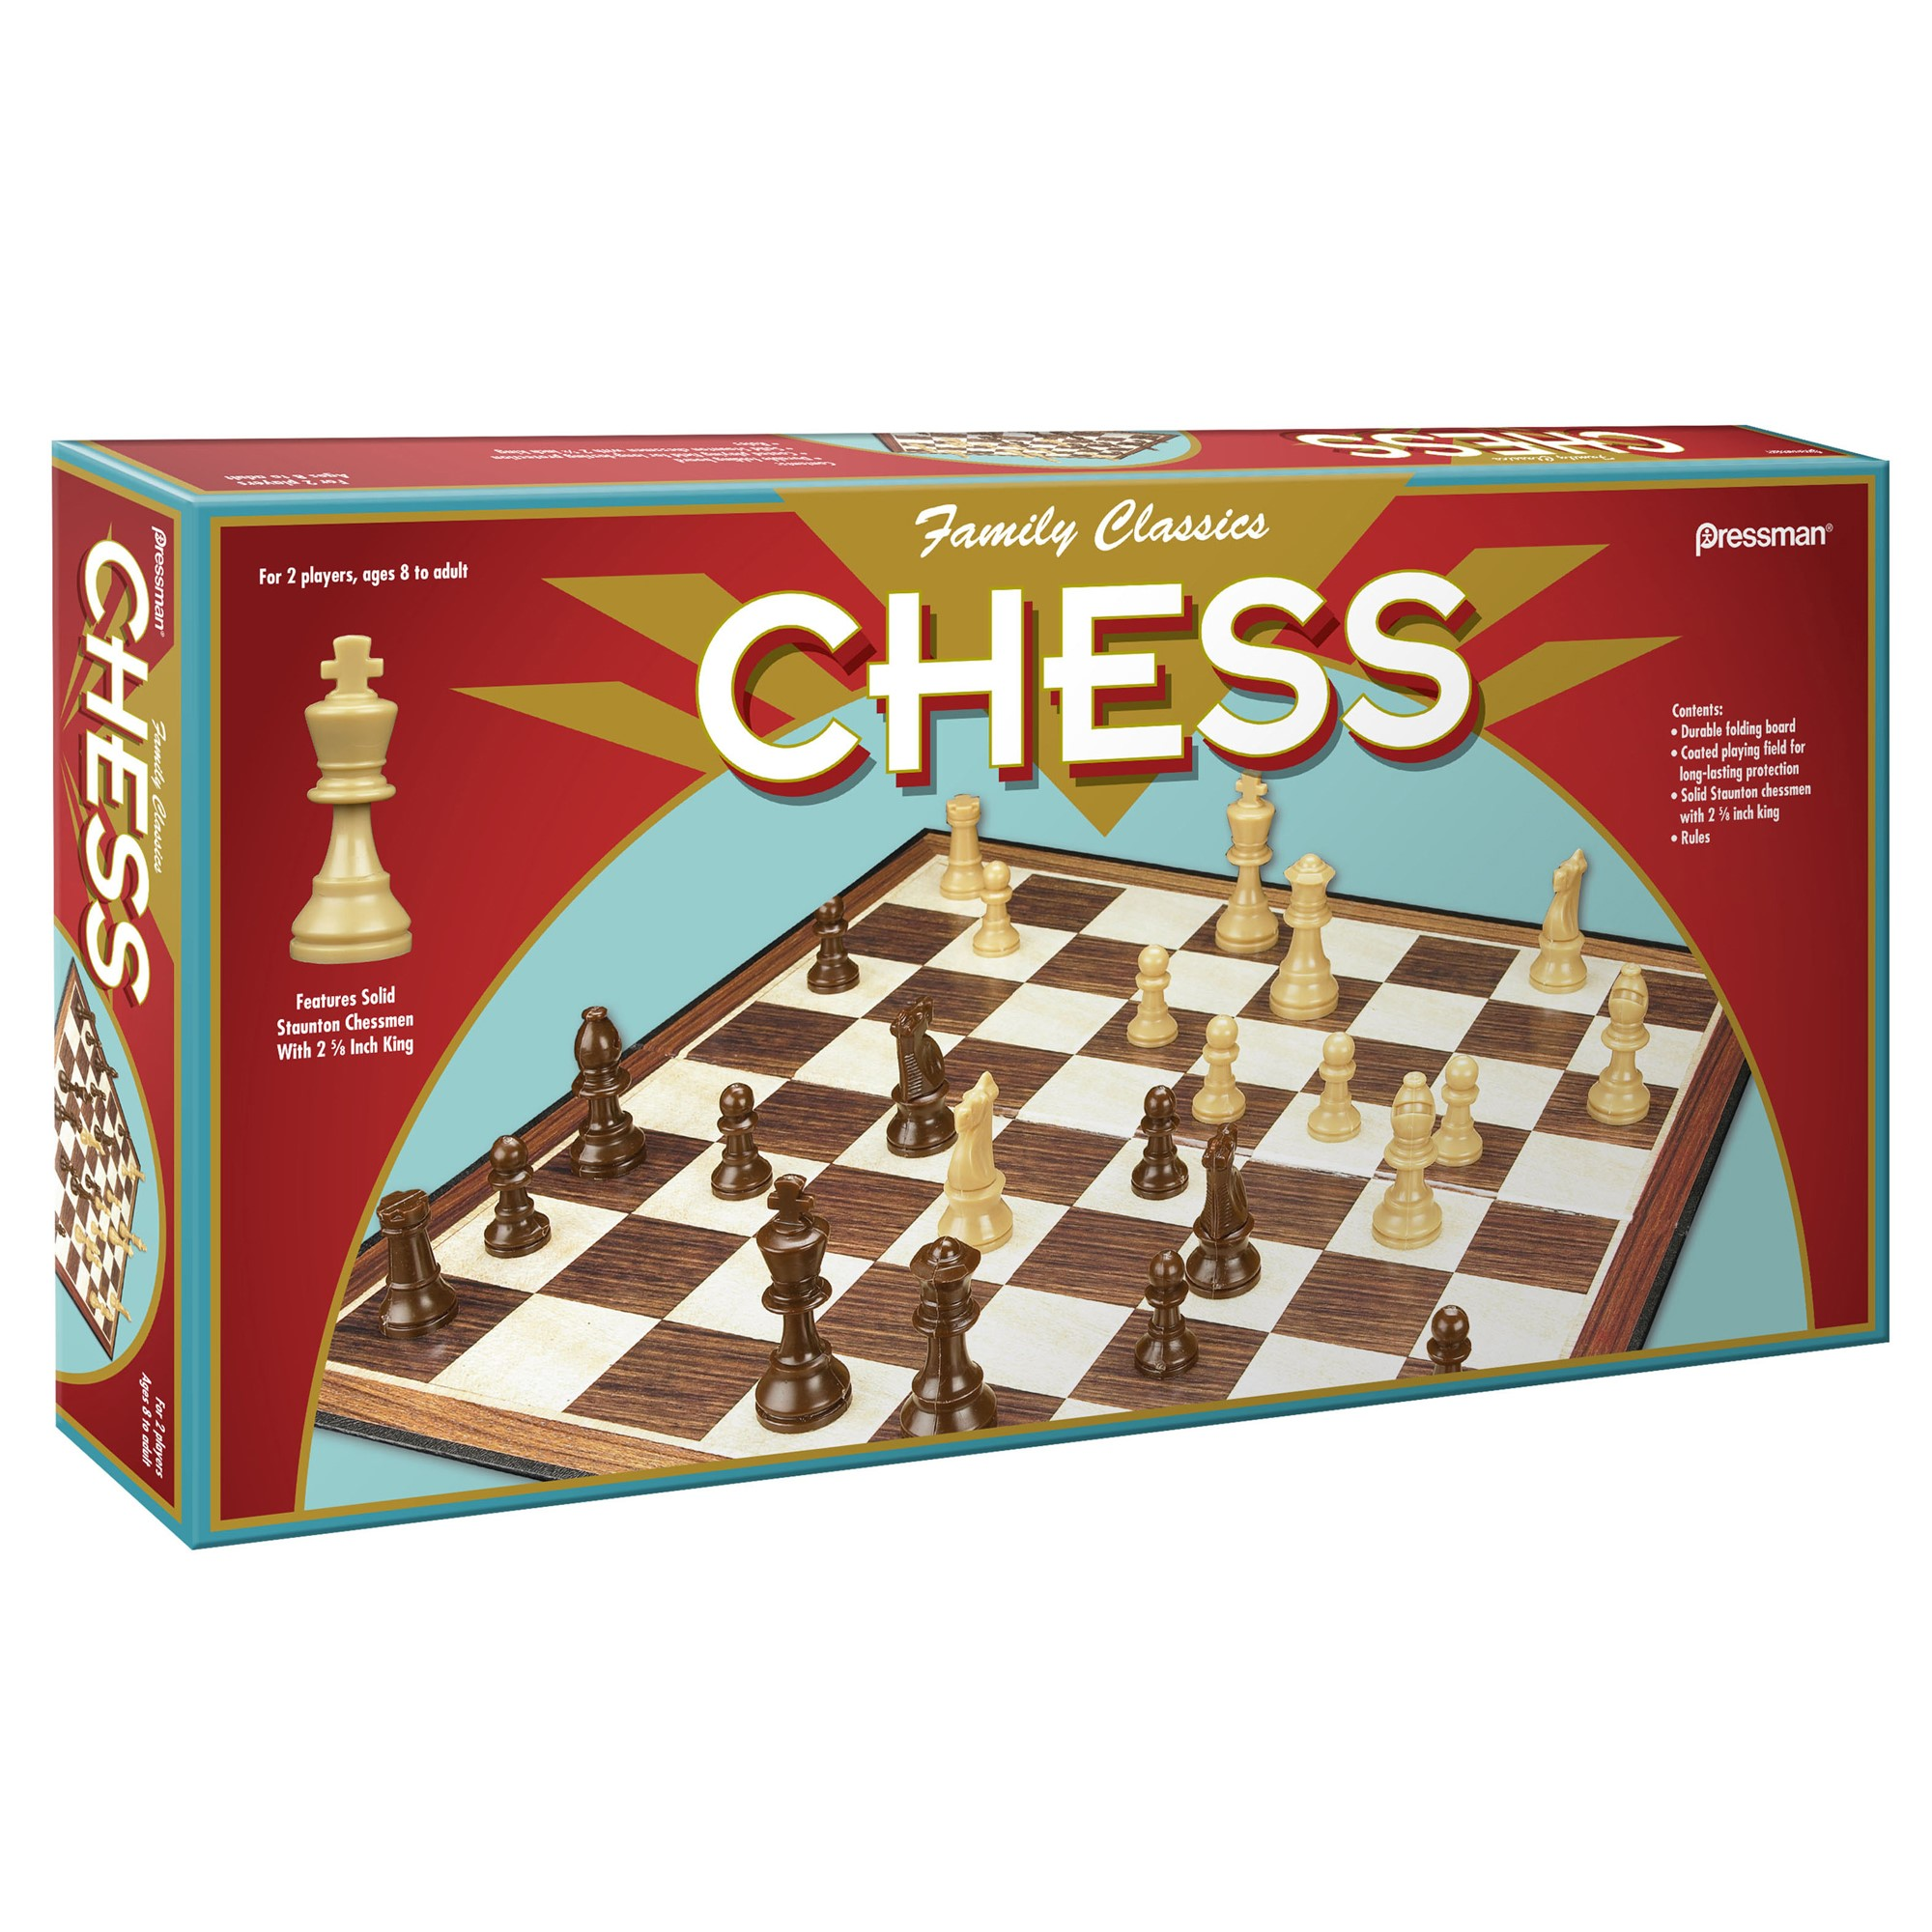 Chess (Family Classics)